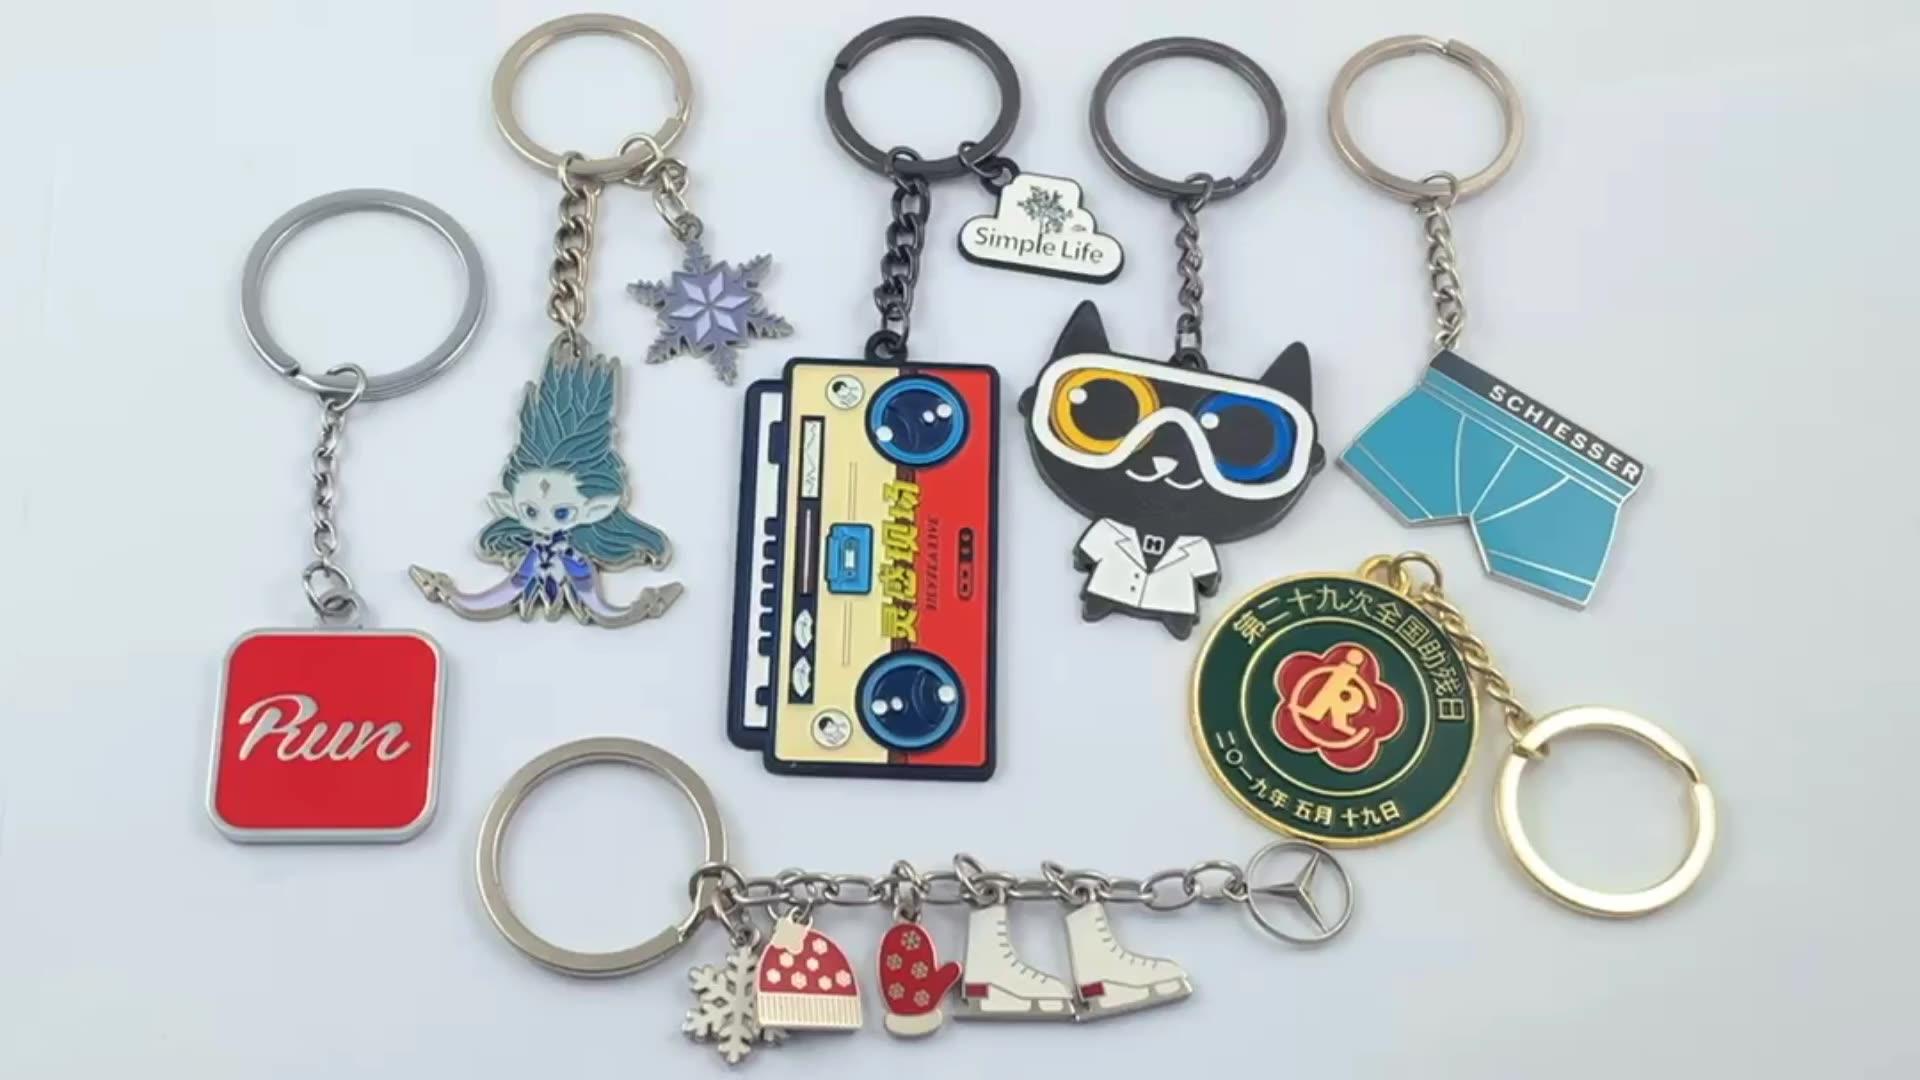 Custom metal cheap keychain promotion photo printed keychain wholesale keychain